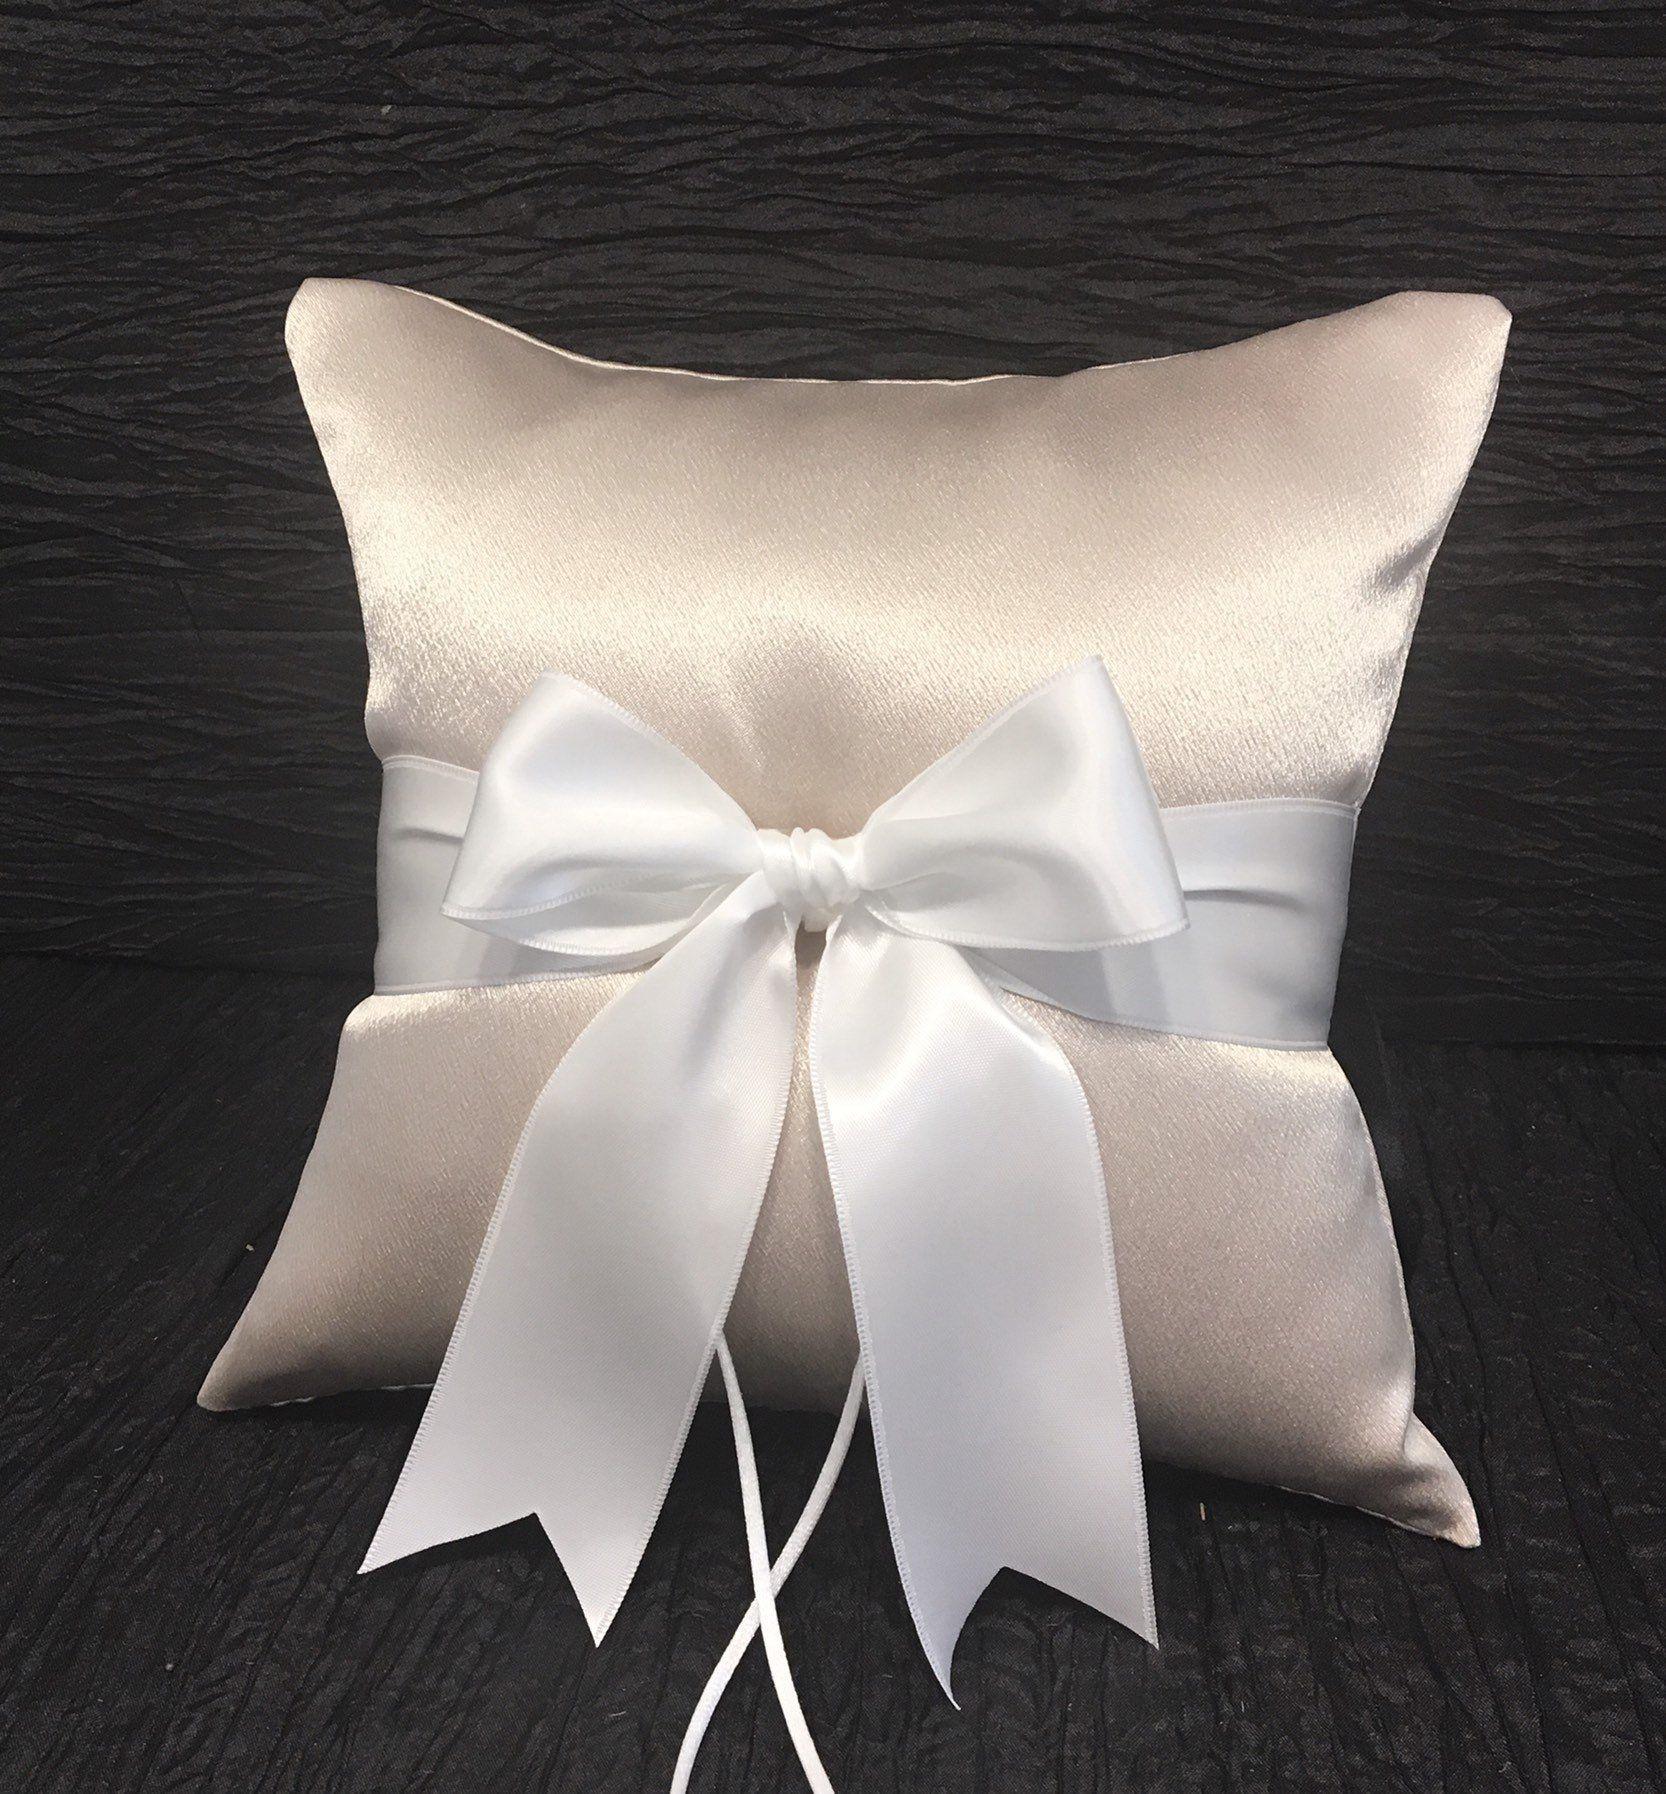 GB10c White Satin Bow Ring Bearer Pillows